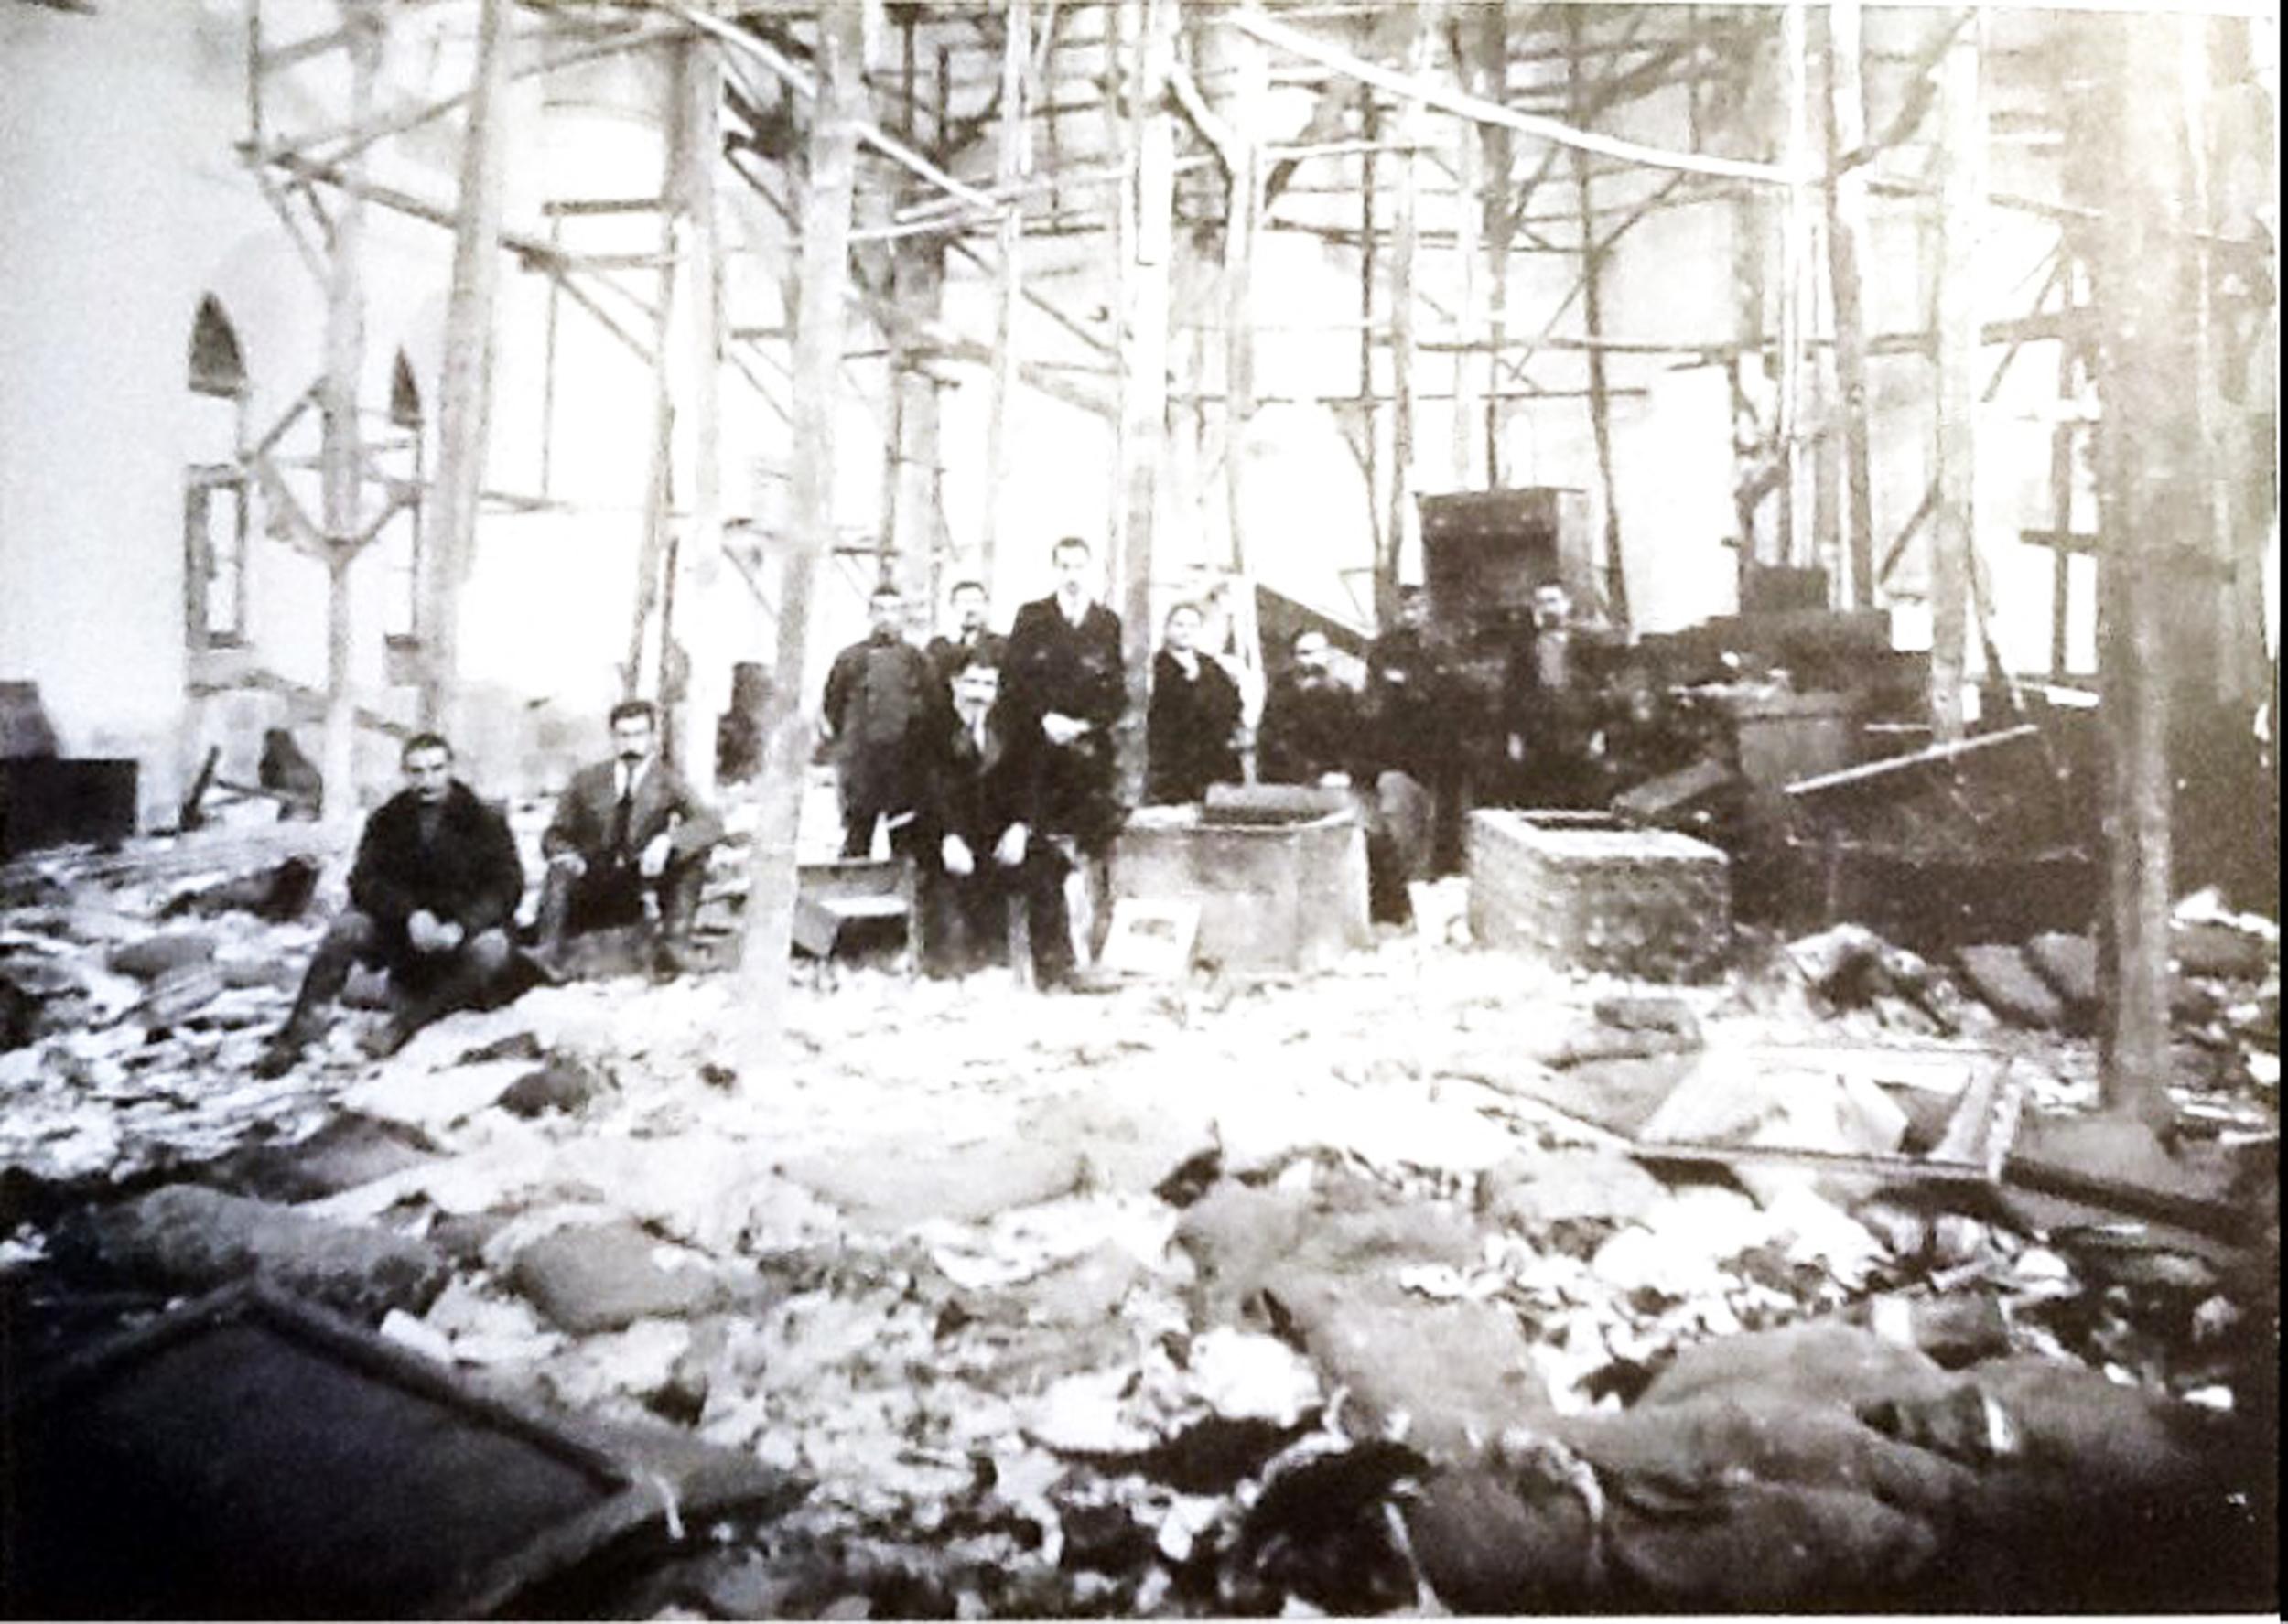 Trabzon Surp Istepannos Kilisesi 1915te el konulan ermeni malları katliam sonrası.jpg